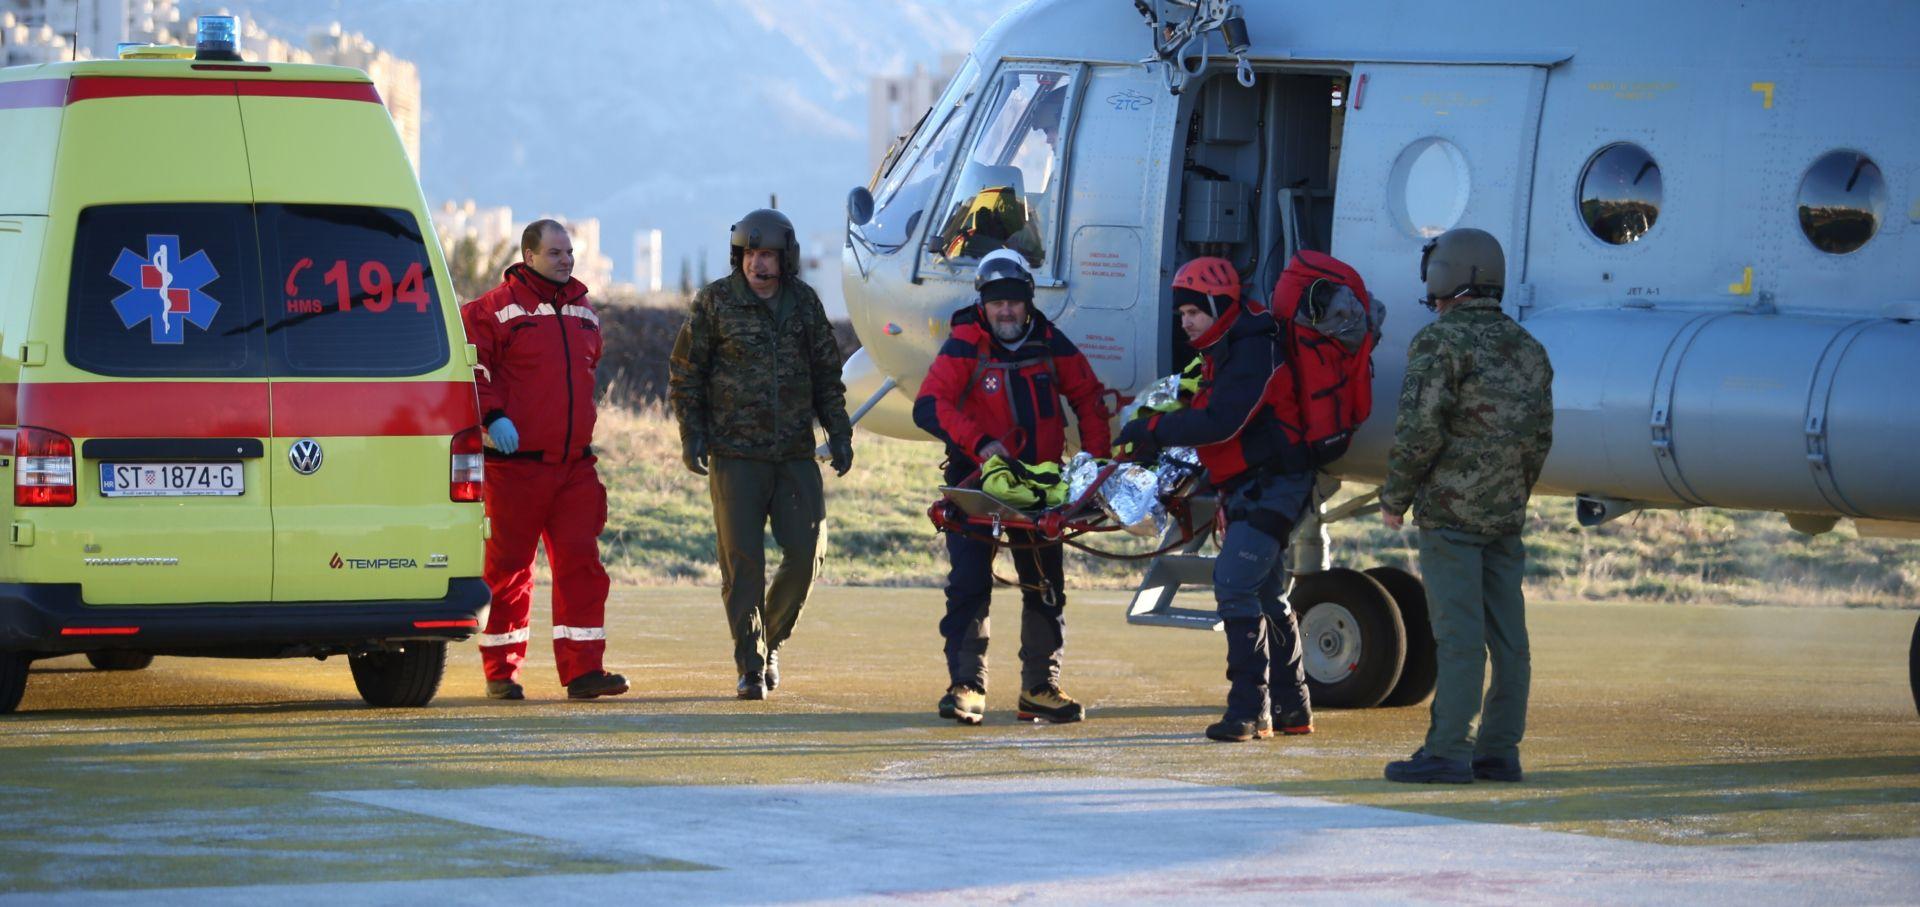 HGSS Ozlijeđeni planinar s Mosora helikopterom prebačen na Firule